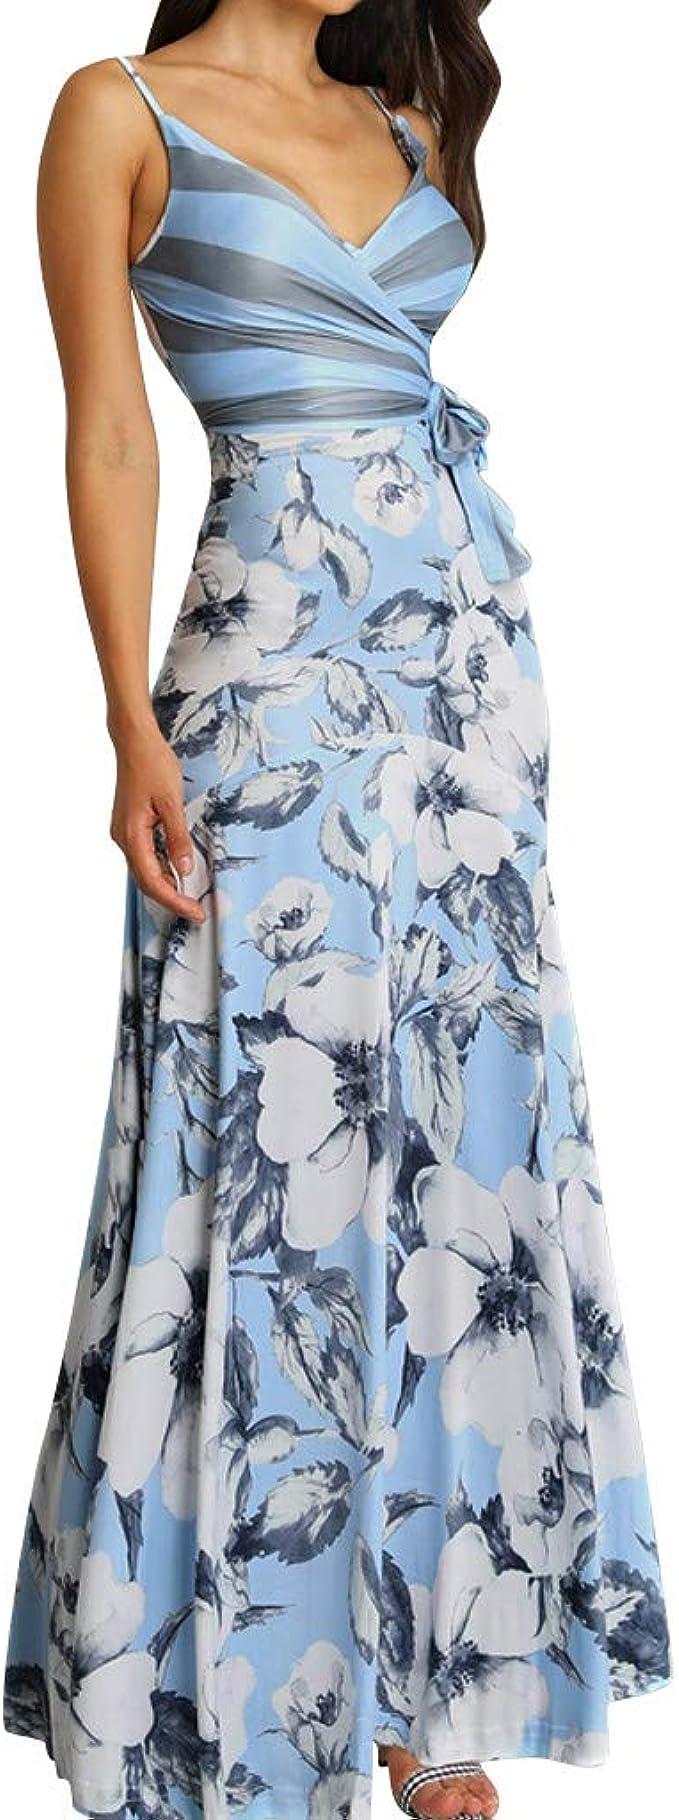 Oksea Sommerkleider Damen Ärmellos V Ausschnitt Strand Blumen Kleider  Abendkleid lang Damen Blumen Kleid Ärmellos V Ausschnitt Kleider Lange  Kleid